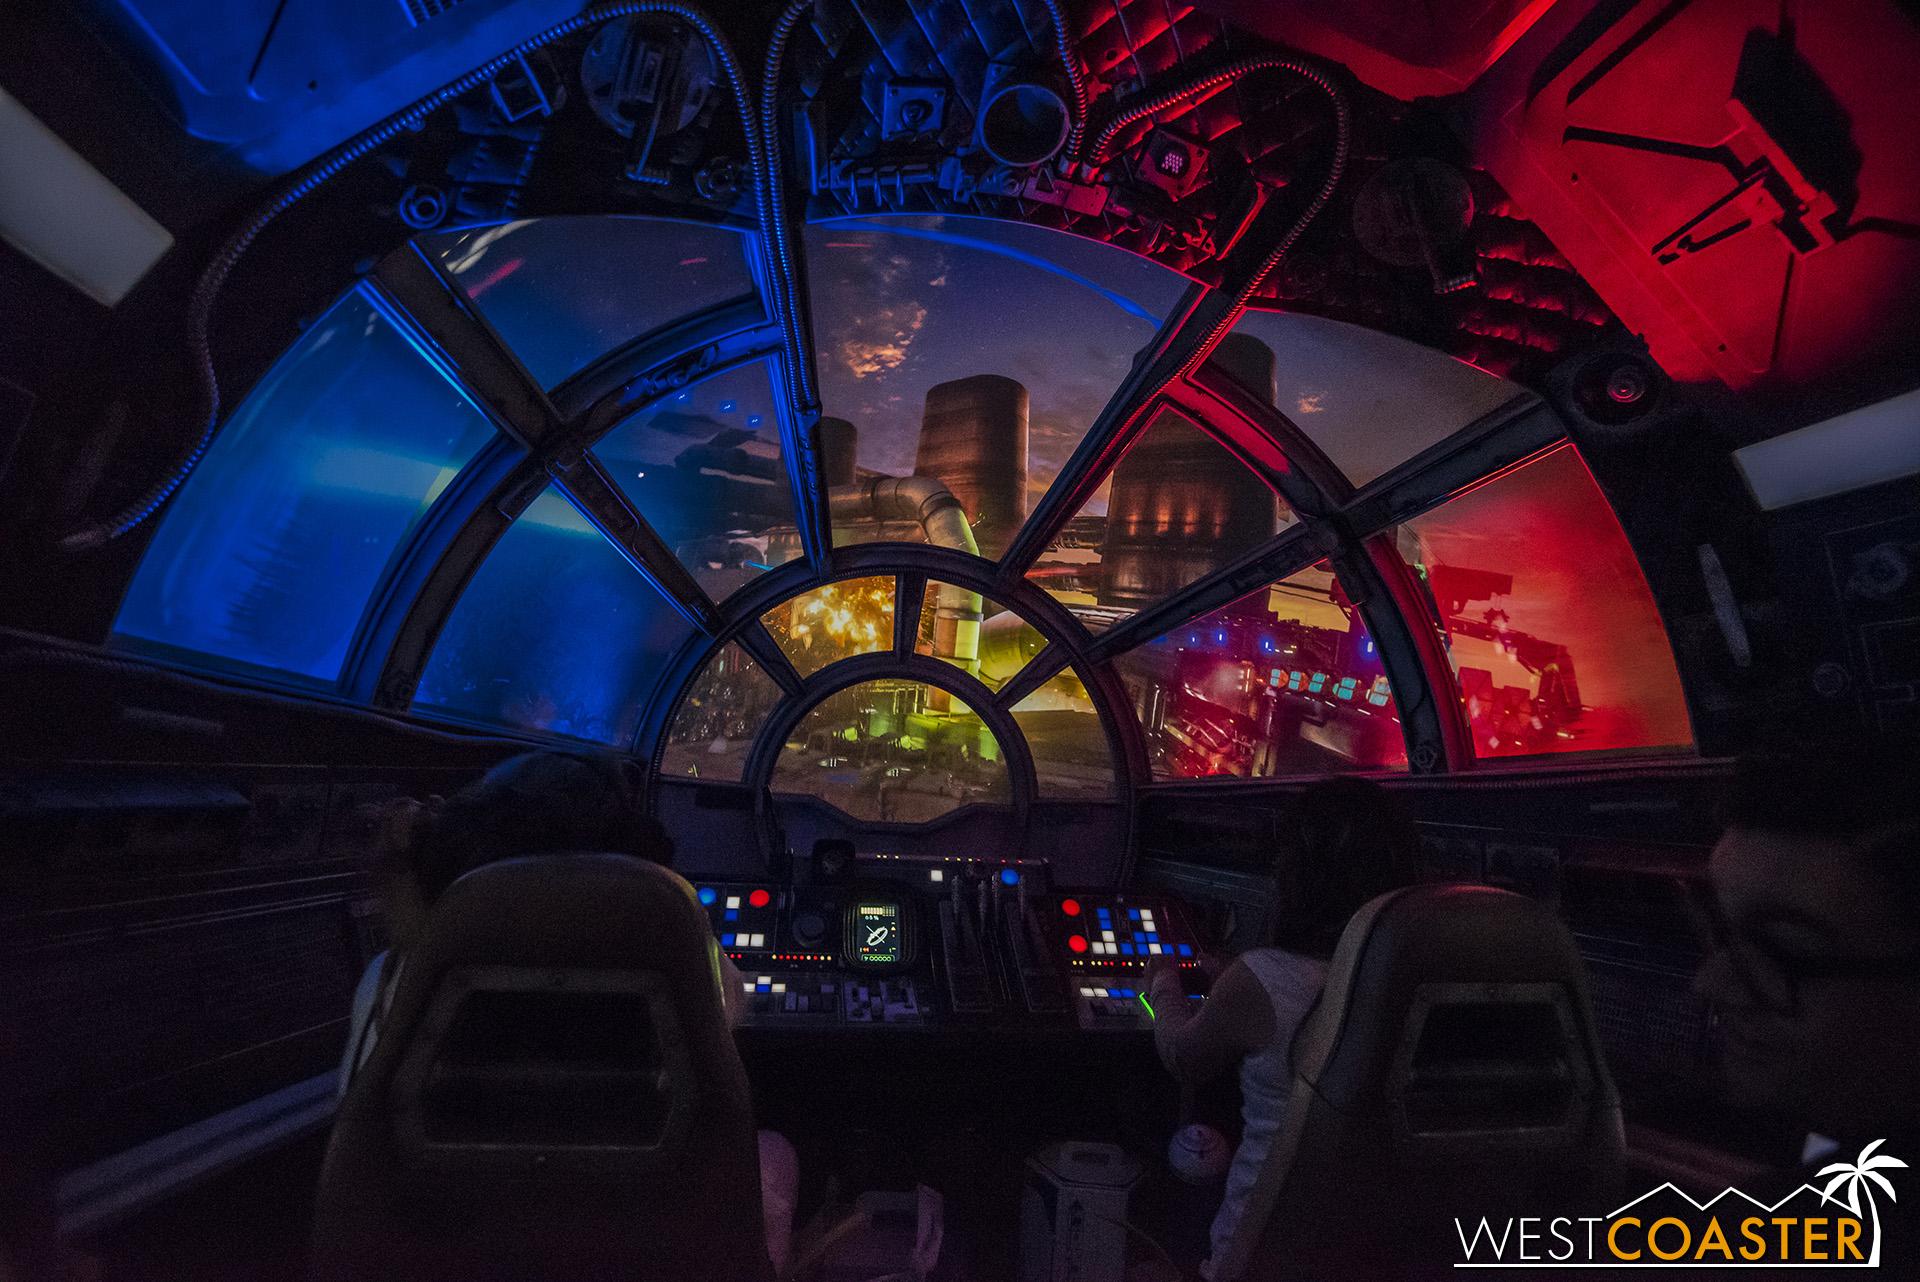 DLR-19_0606-D-Cockpit-0006.jpg